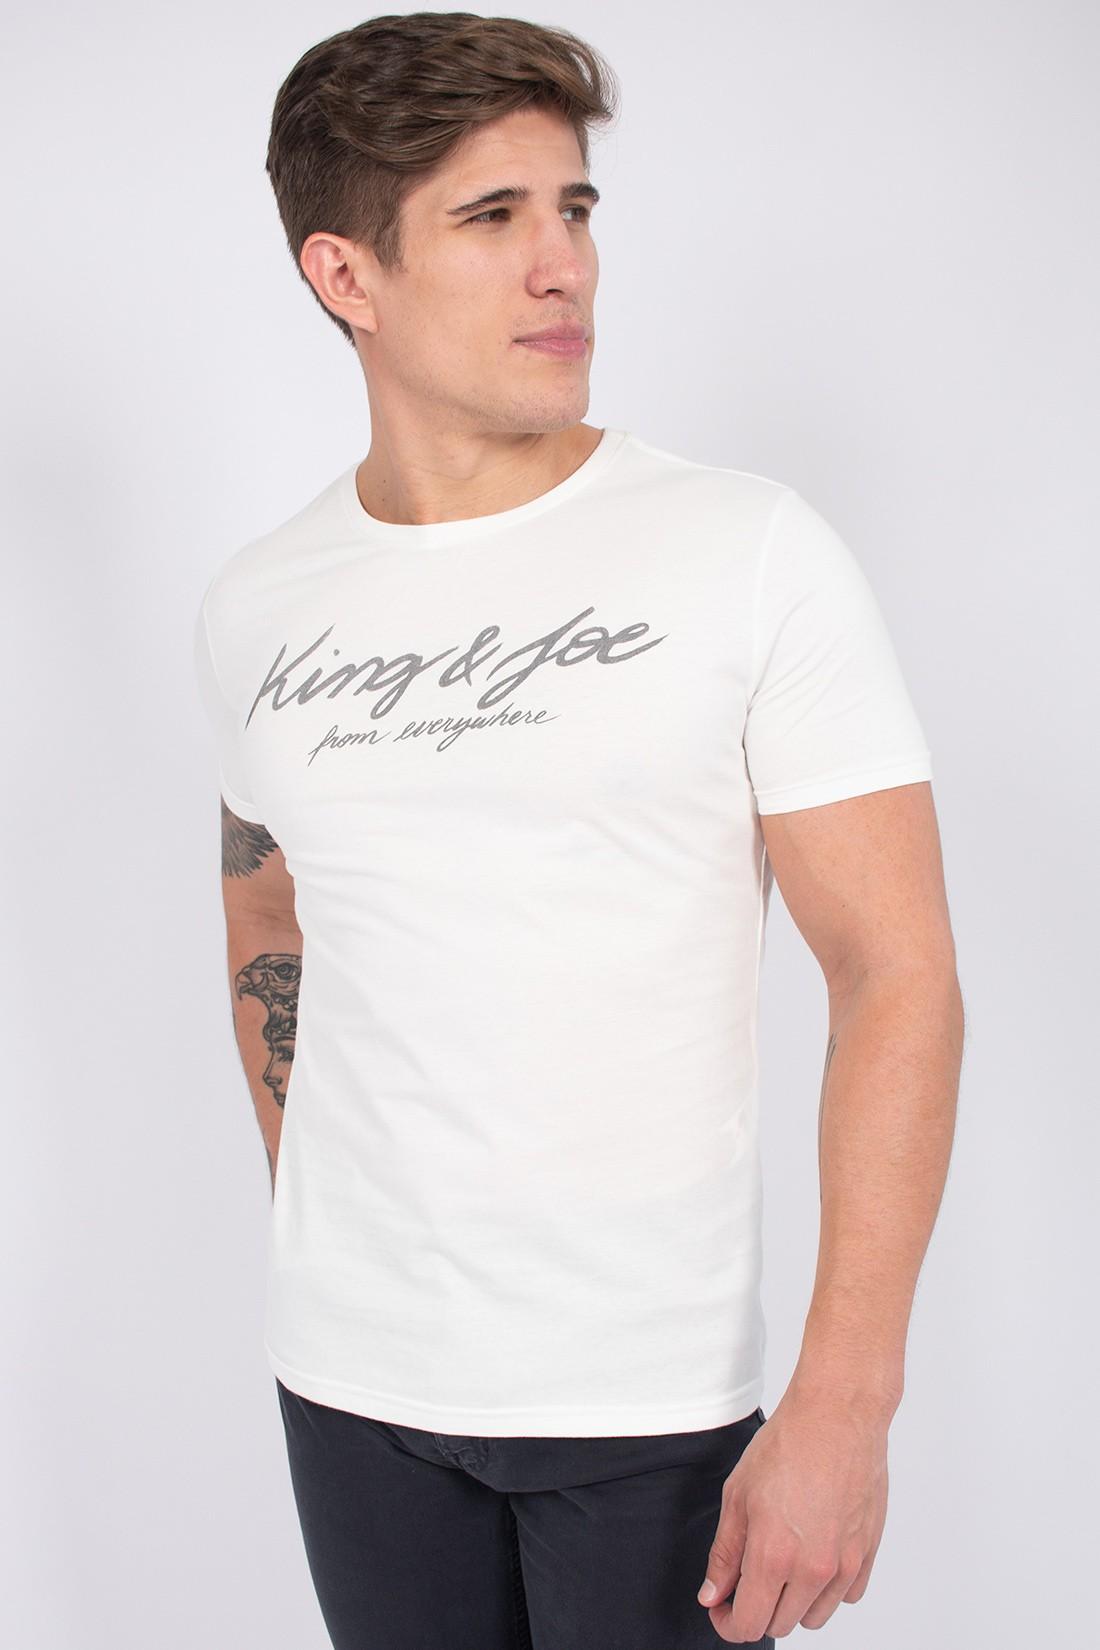 Camiseta Mc King&Joe Institucional